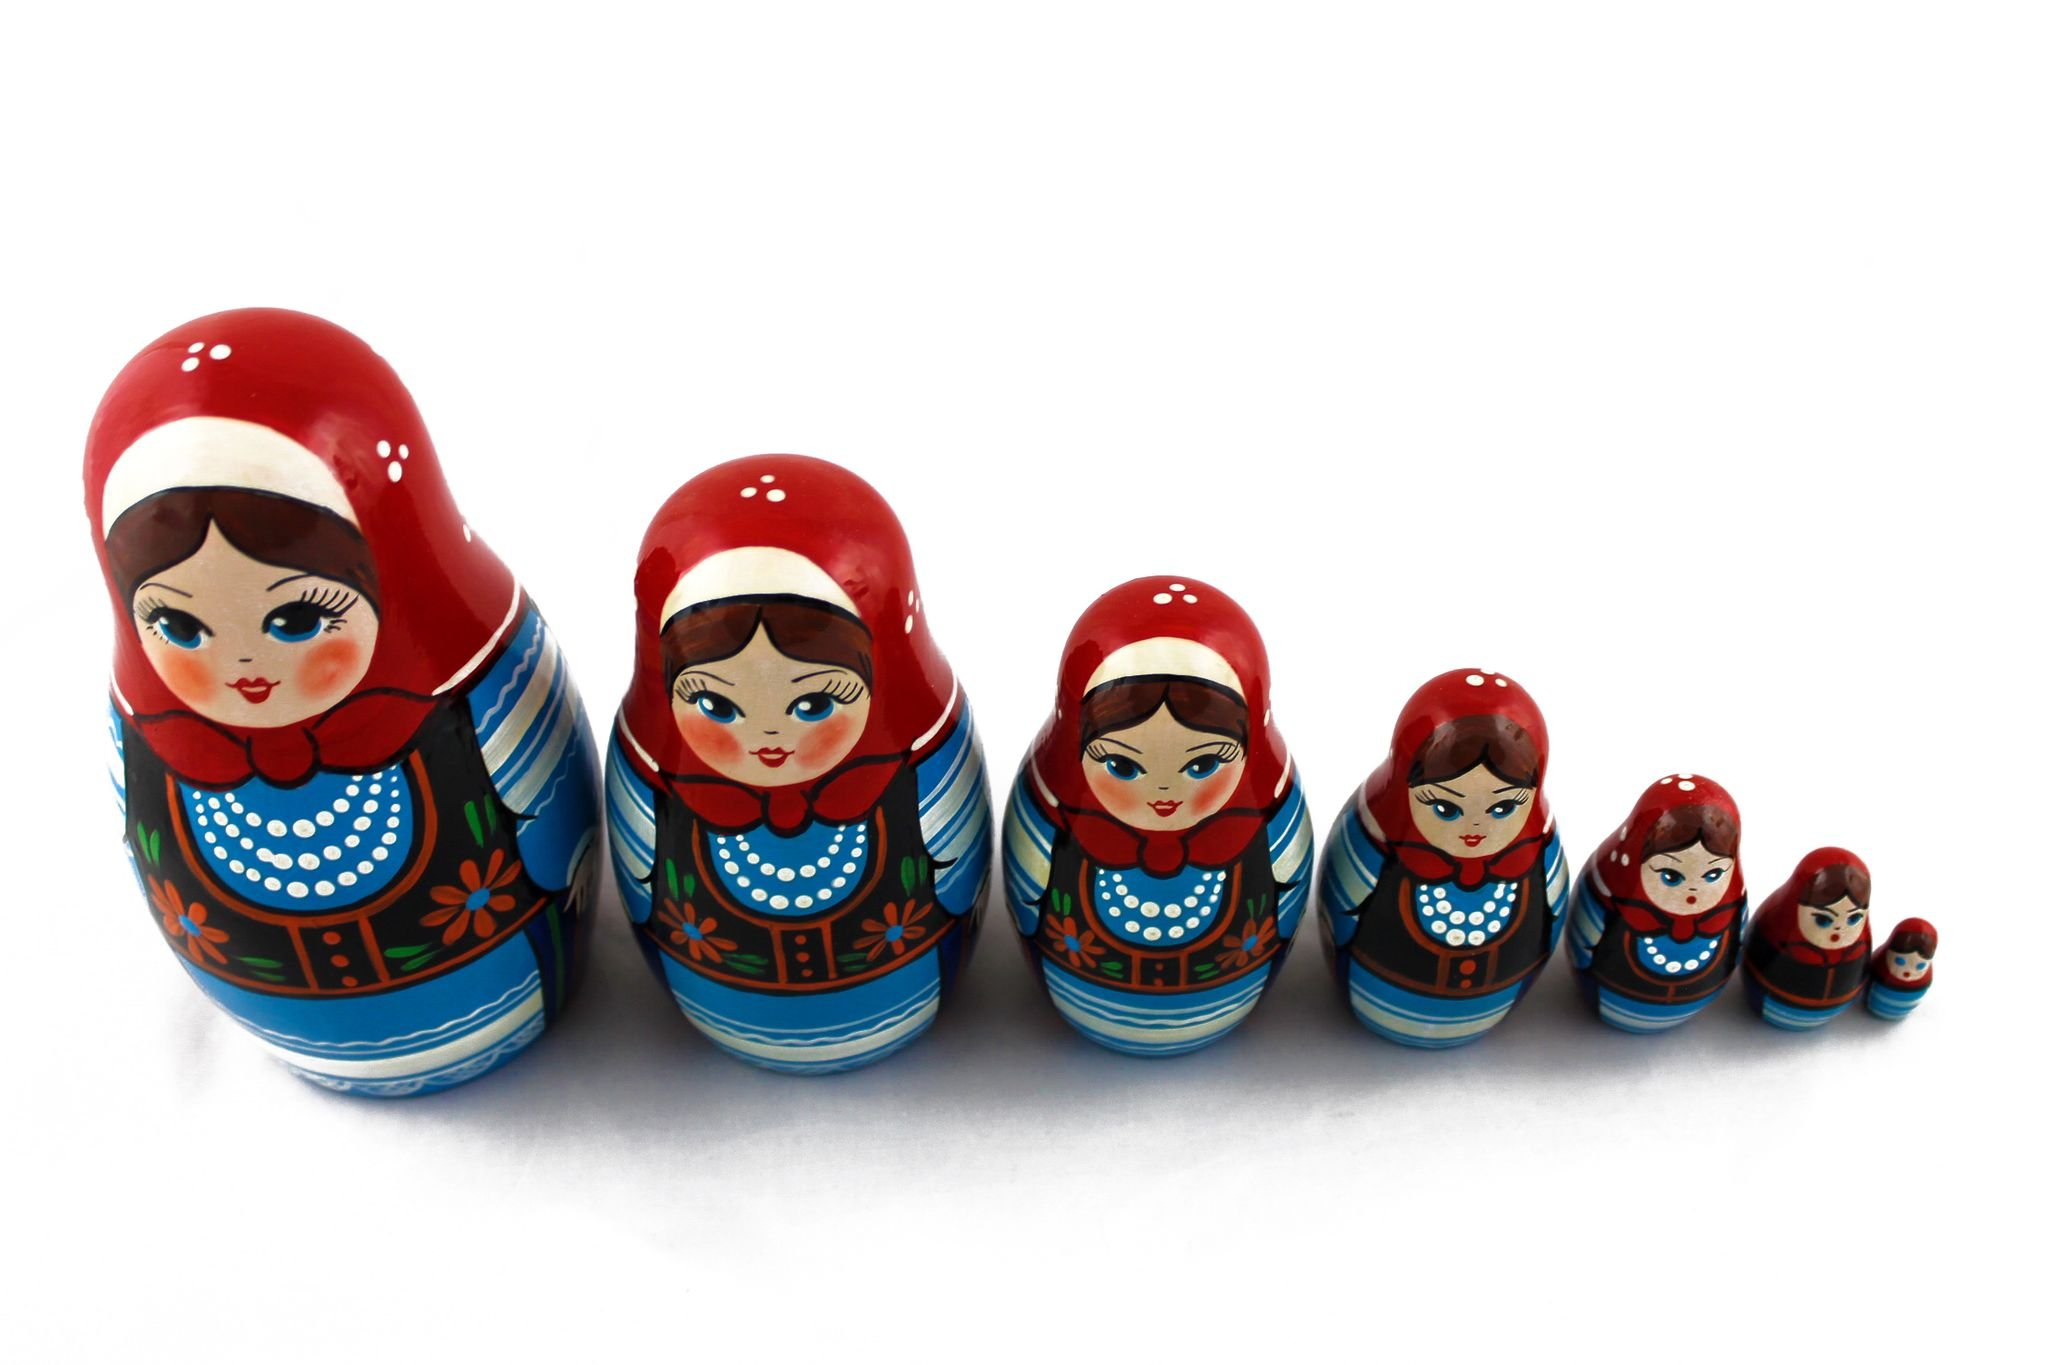 Matryoshka Polish National Dress Babushka Russian Nesting Wooden Stacking Doll 7 Pcs by MATRYOSHKA&HANDICRAFT (Image #4)